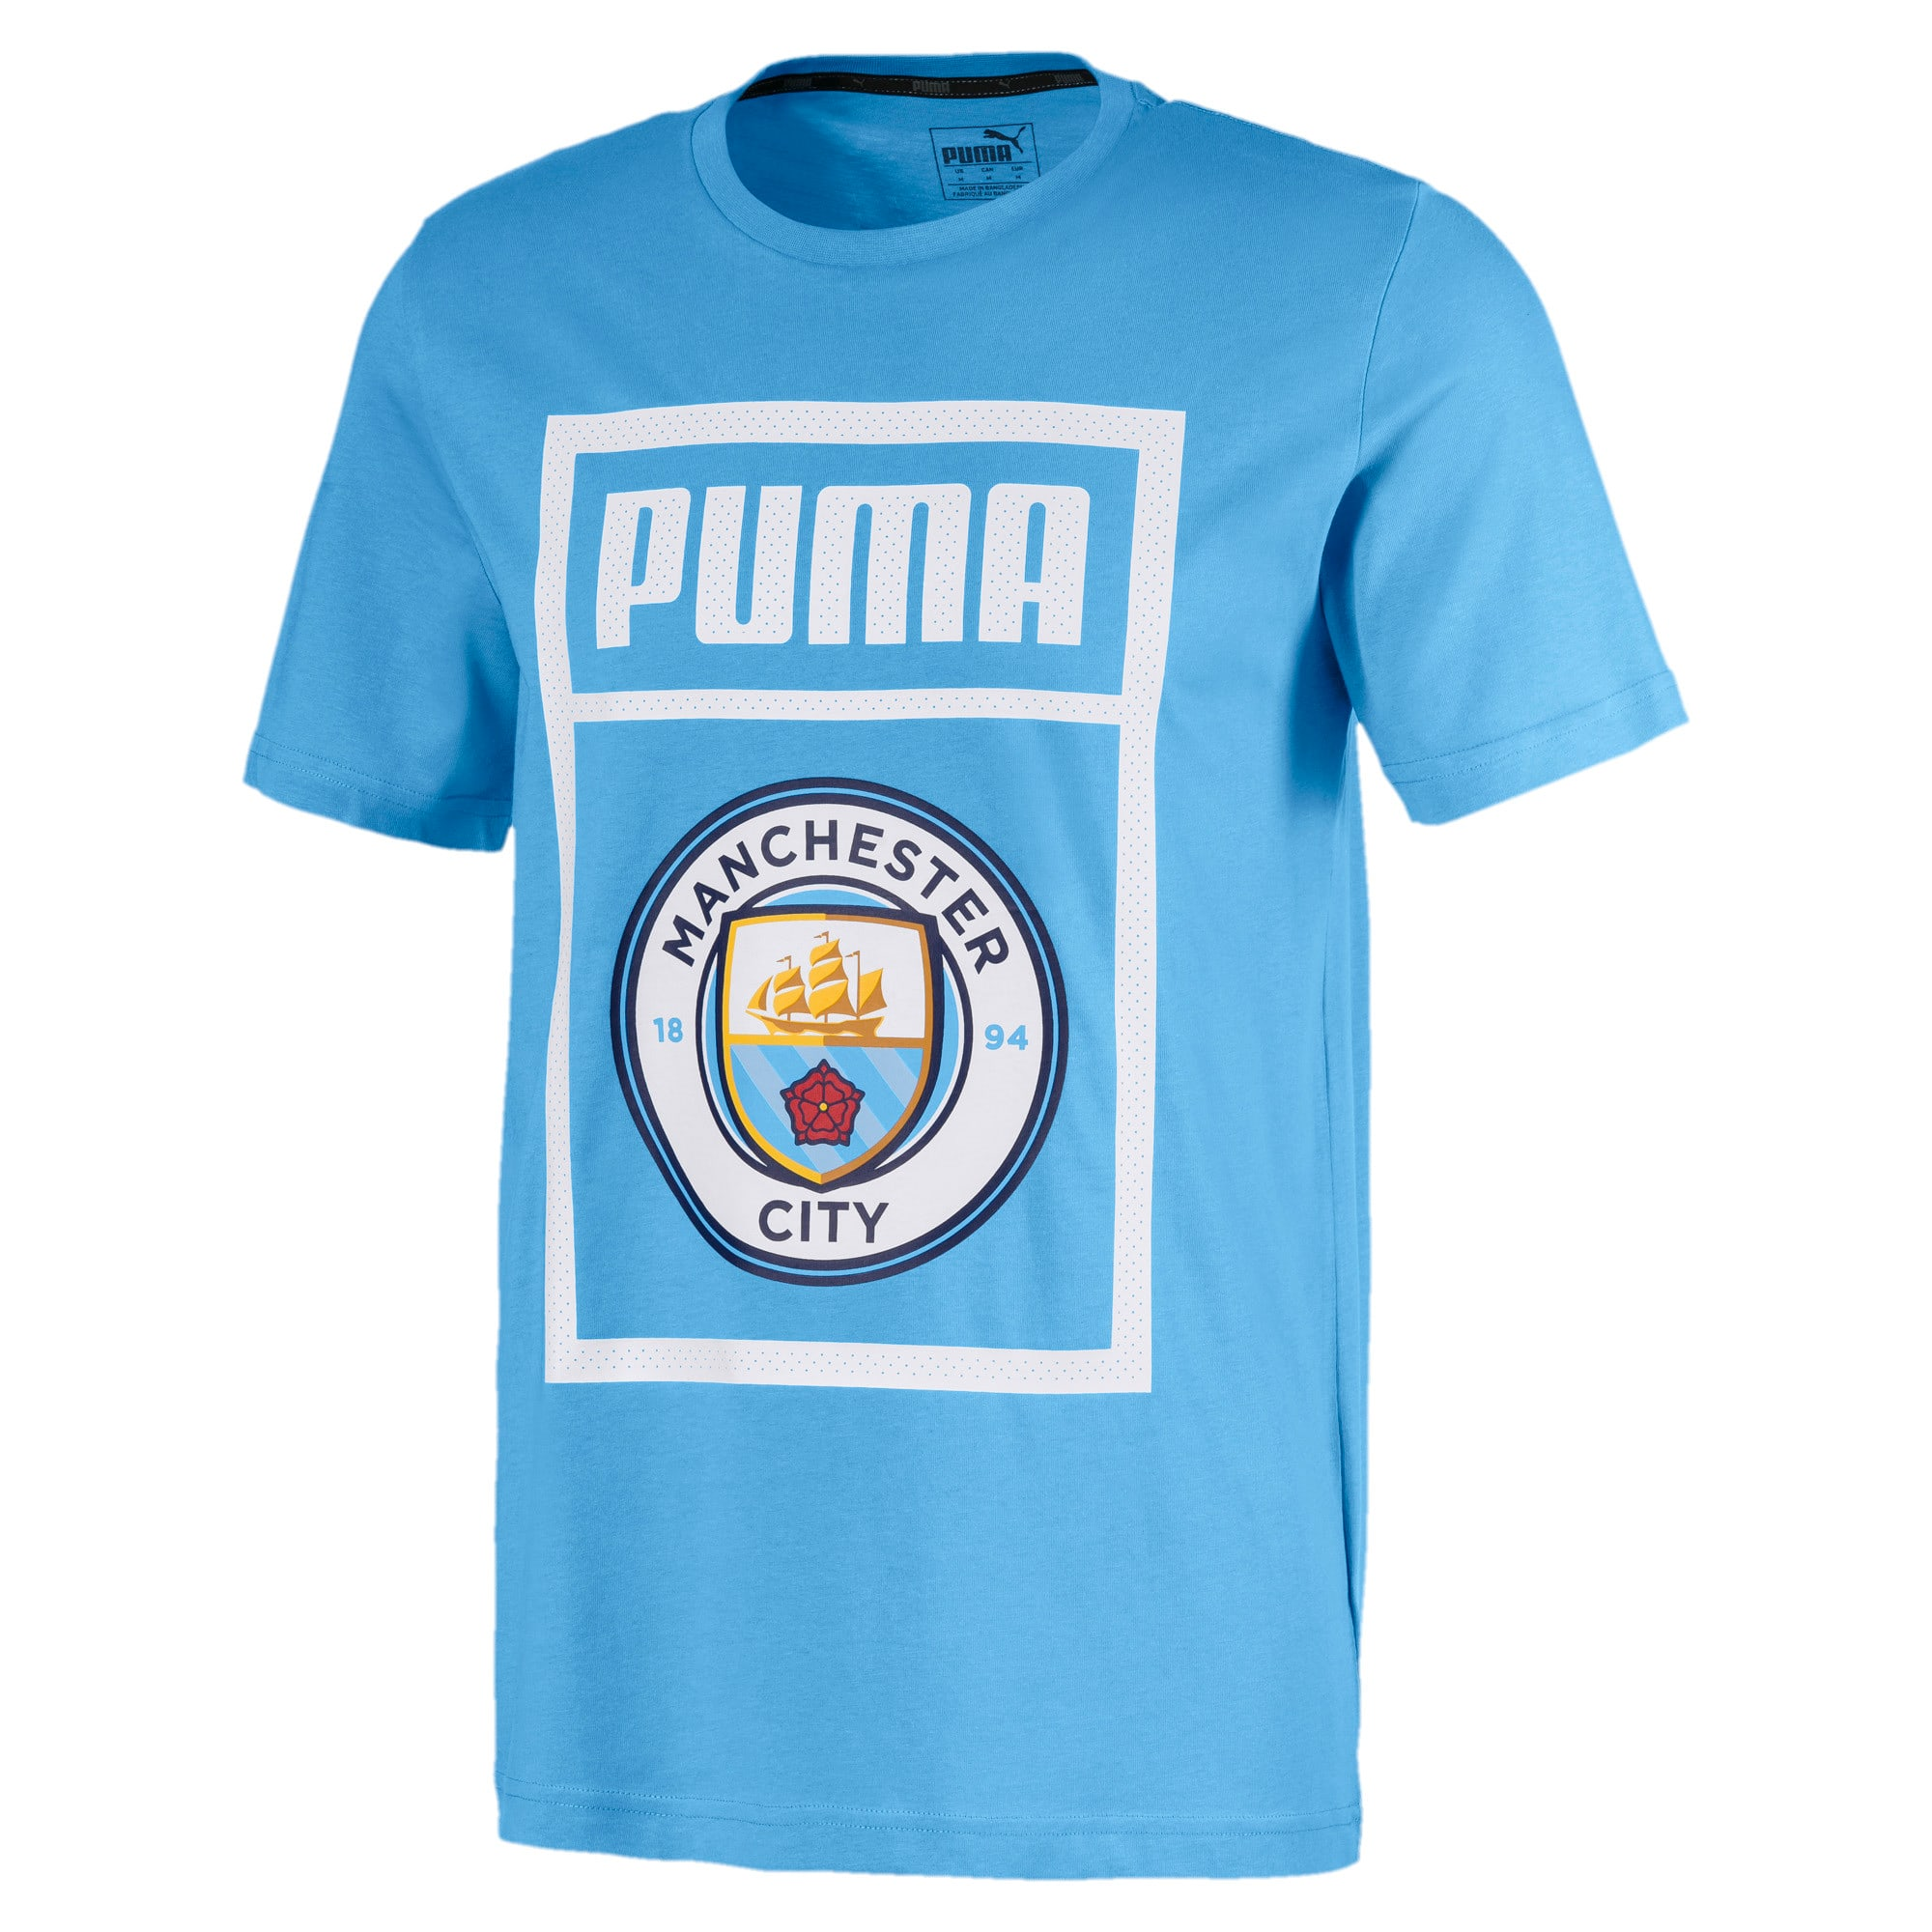 Thumbnail 1 of Manchester City Herren Shoe Tag T-Shirt, Team Light Blue-Puma white, medium